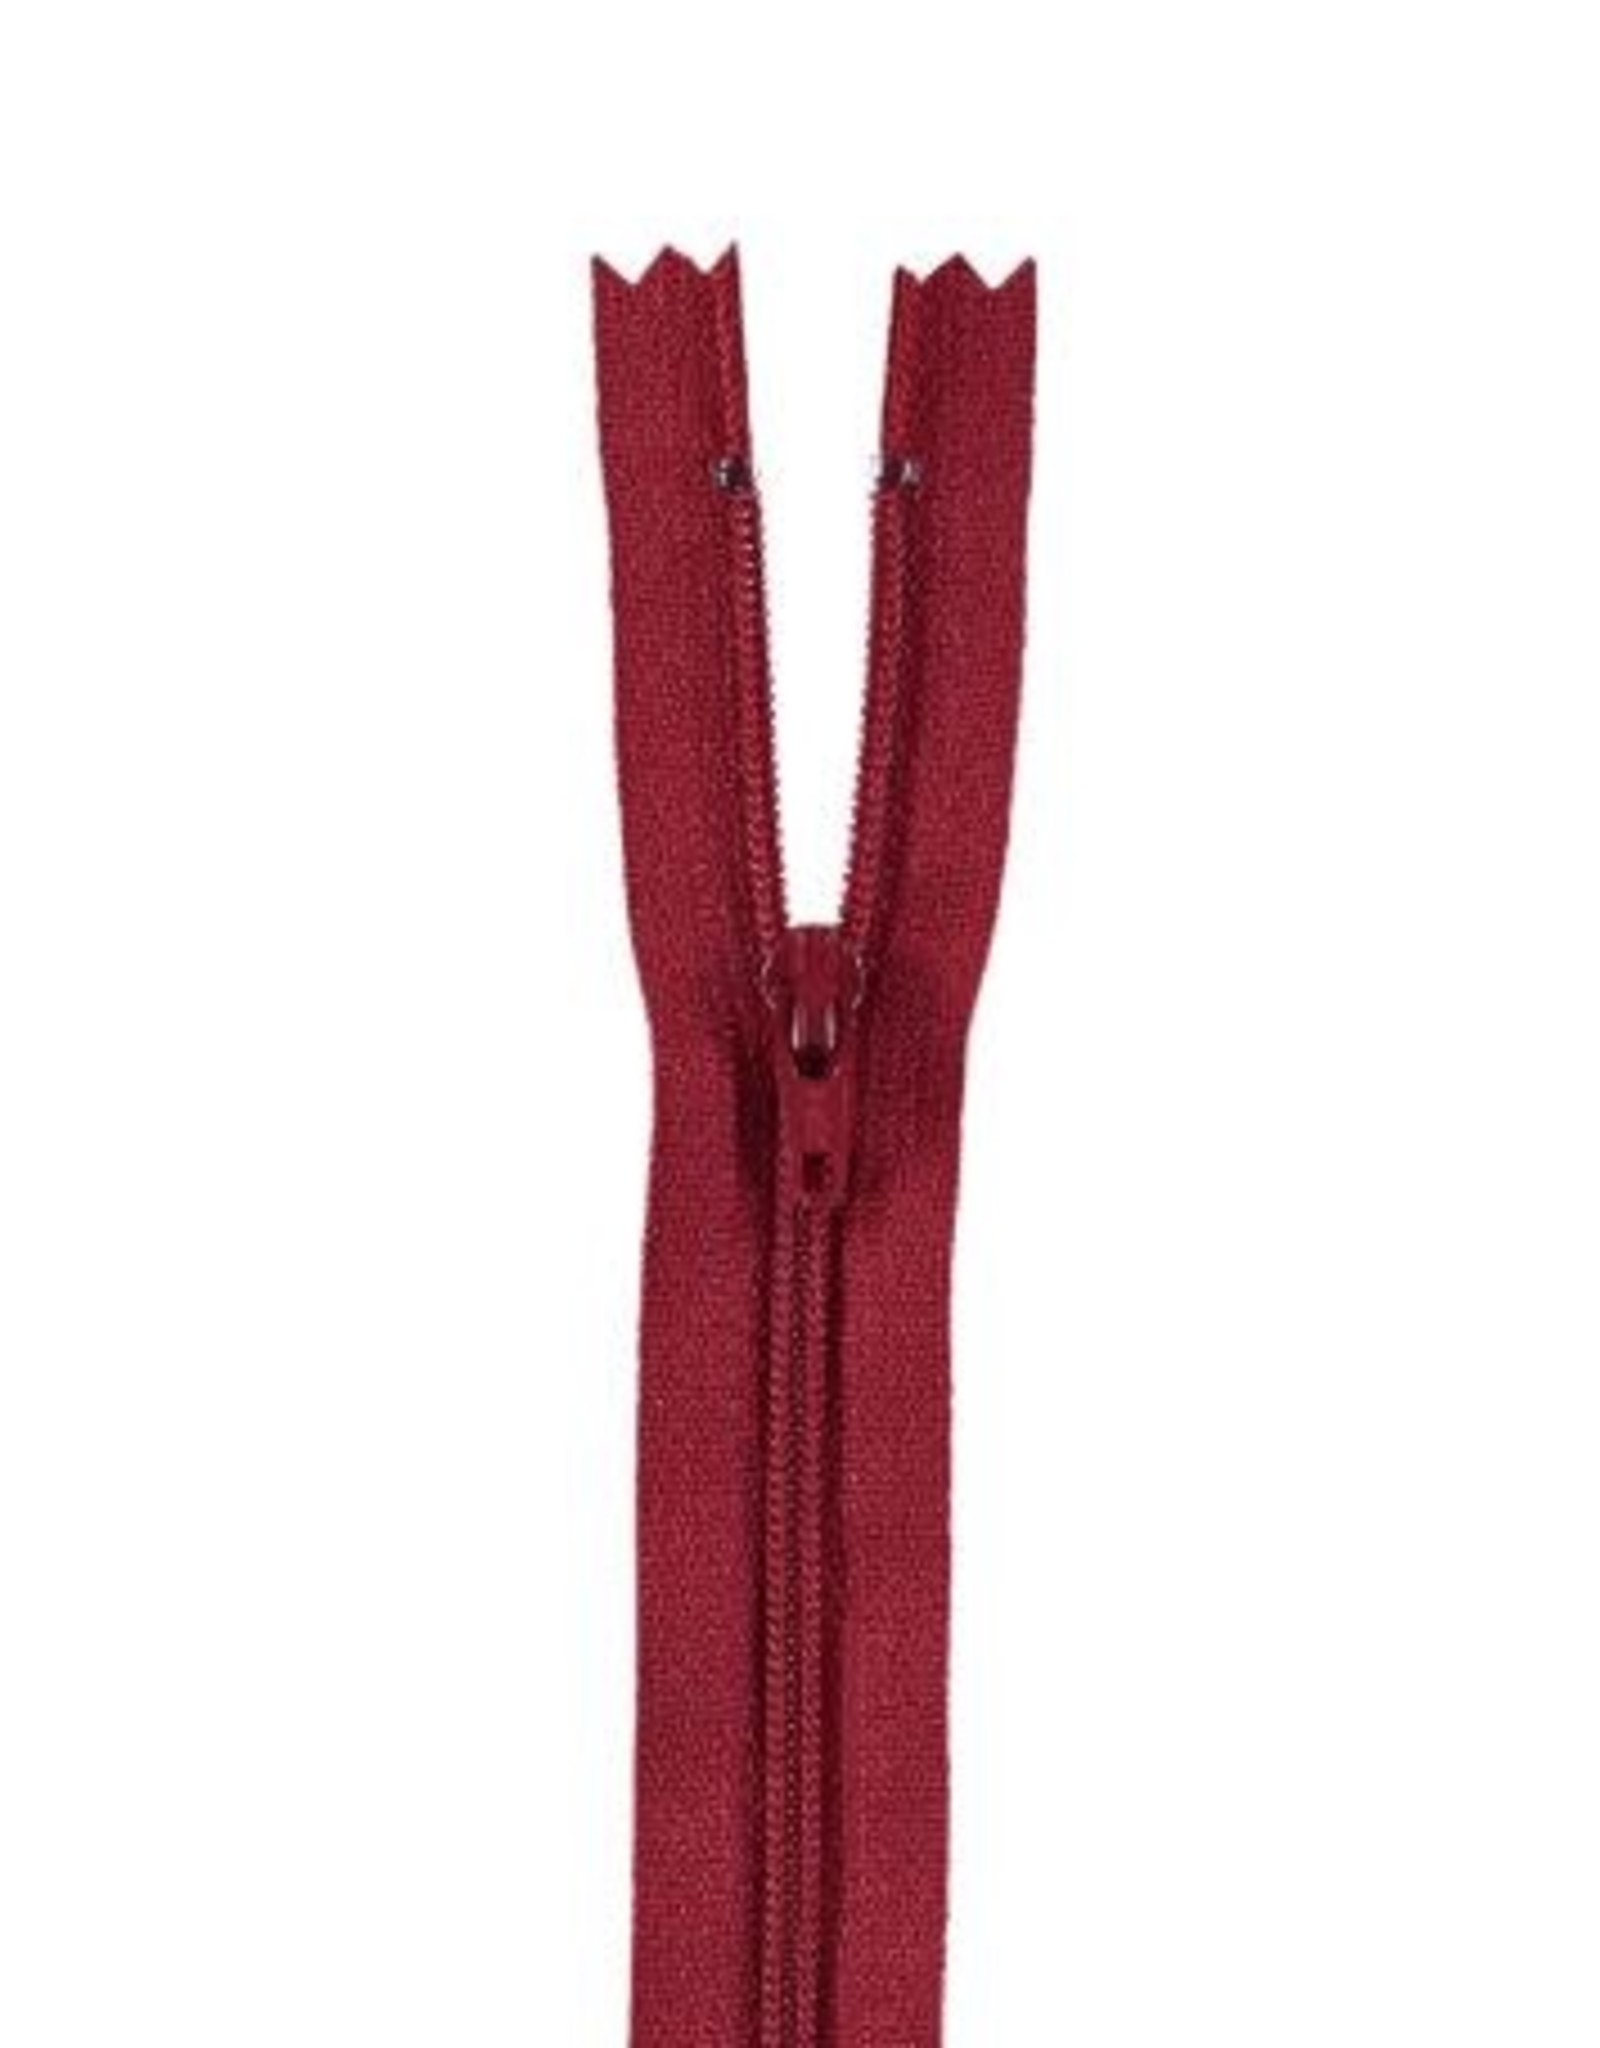 YKK Spiraalrits niet-DB 3mm donker rood 520-18cm